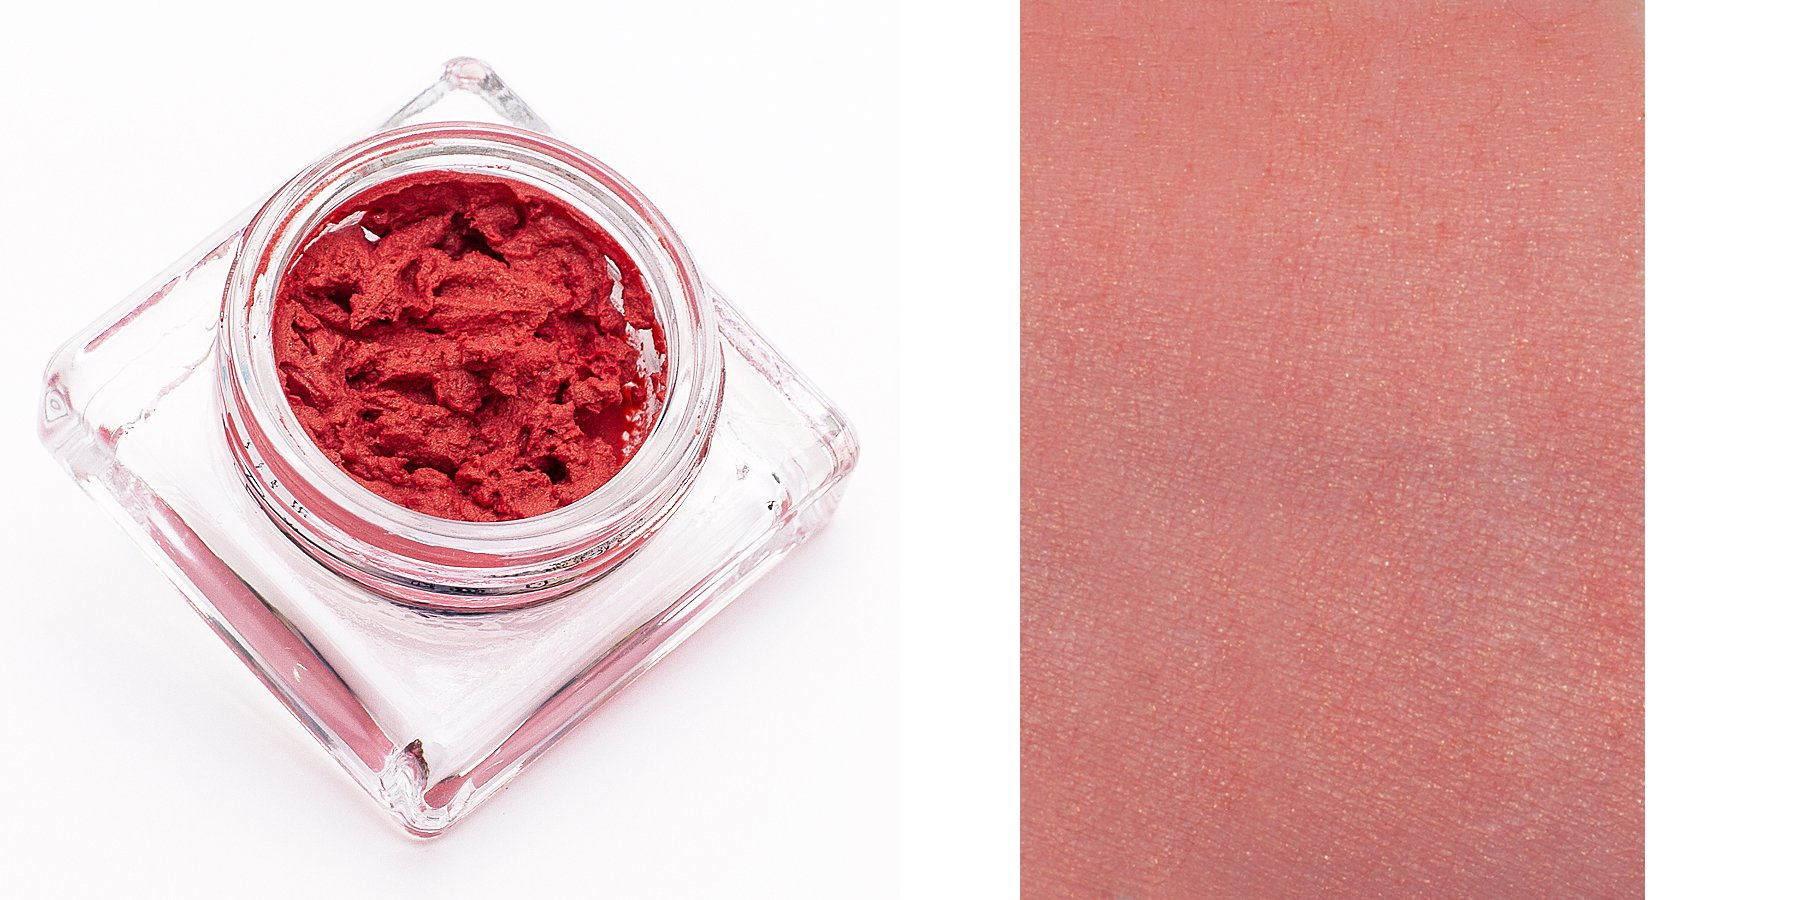 shiseido minimalist whripped powder blush sonoya 01